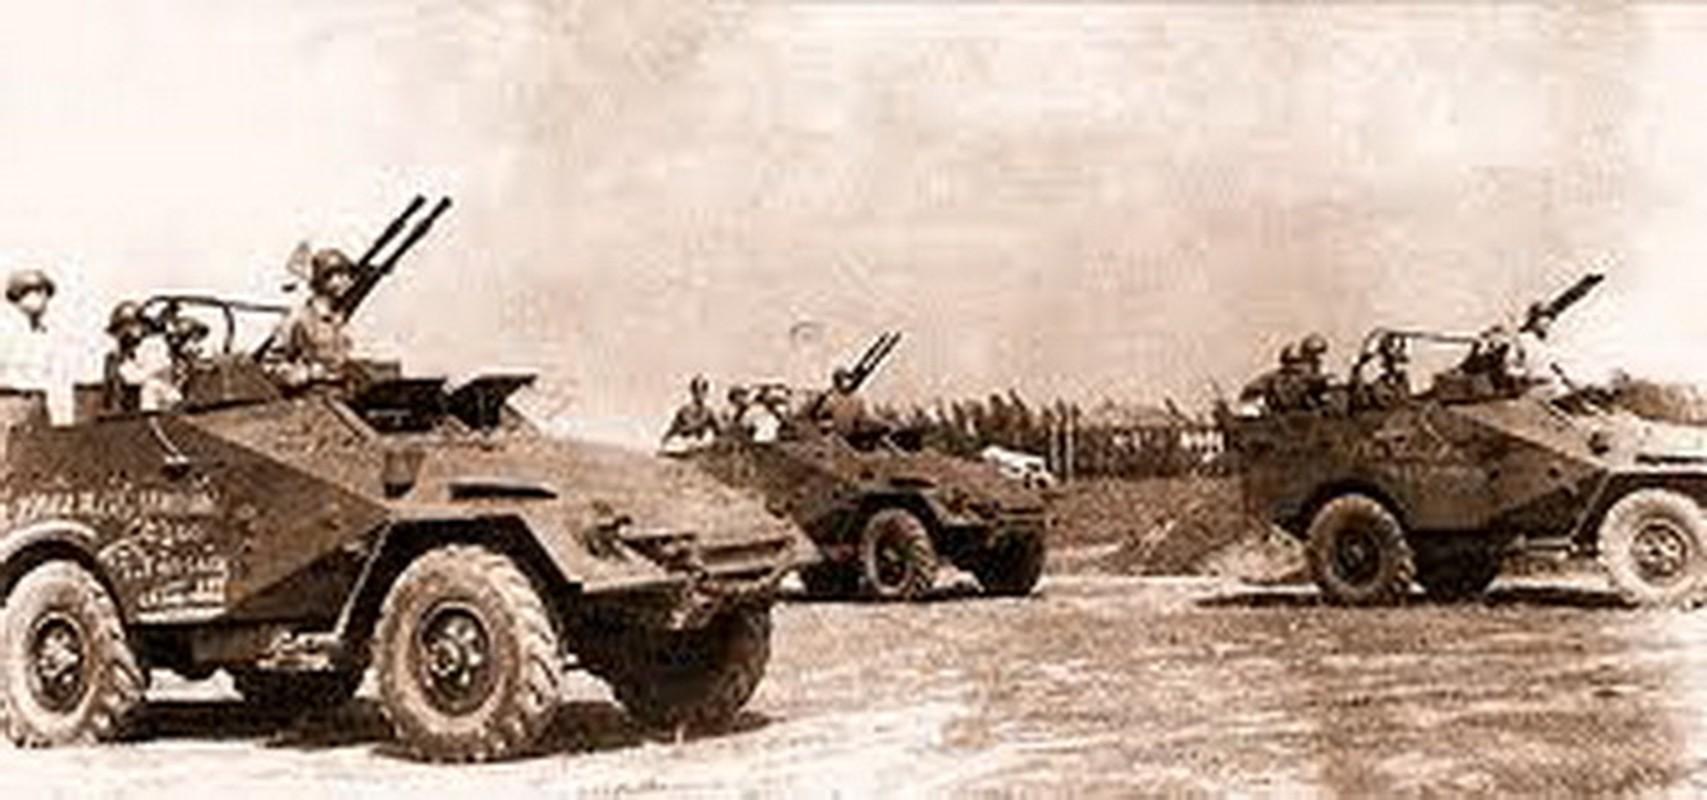 Nga bat ngo khi Viet Nam cai bien thiet giap thanh phao phong khong-Hinh-6